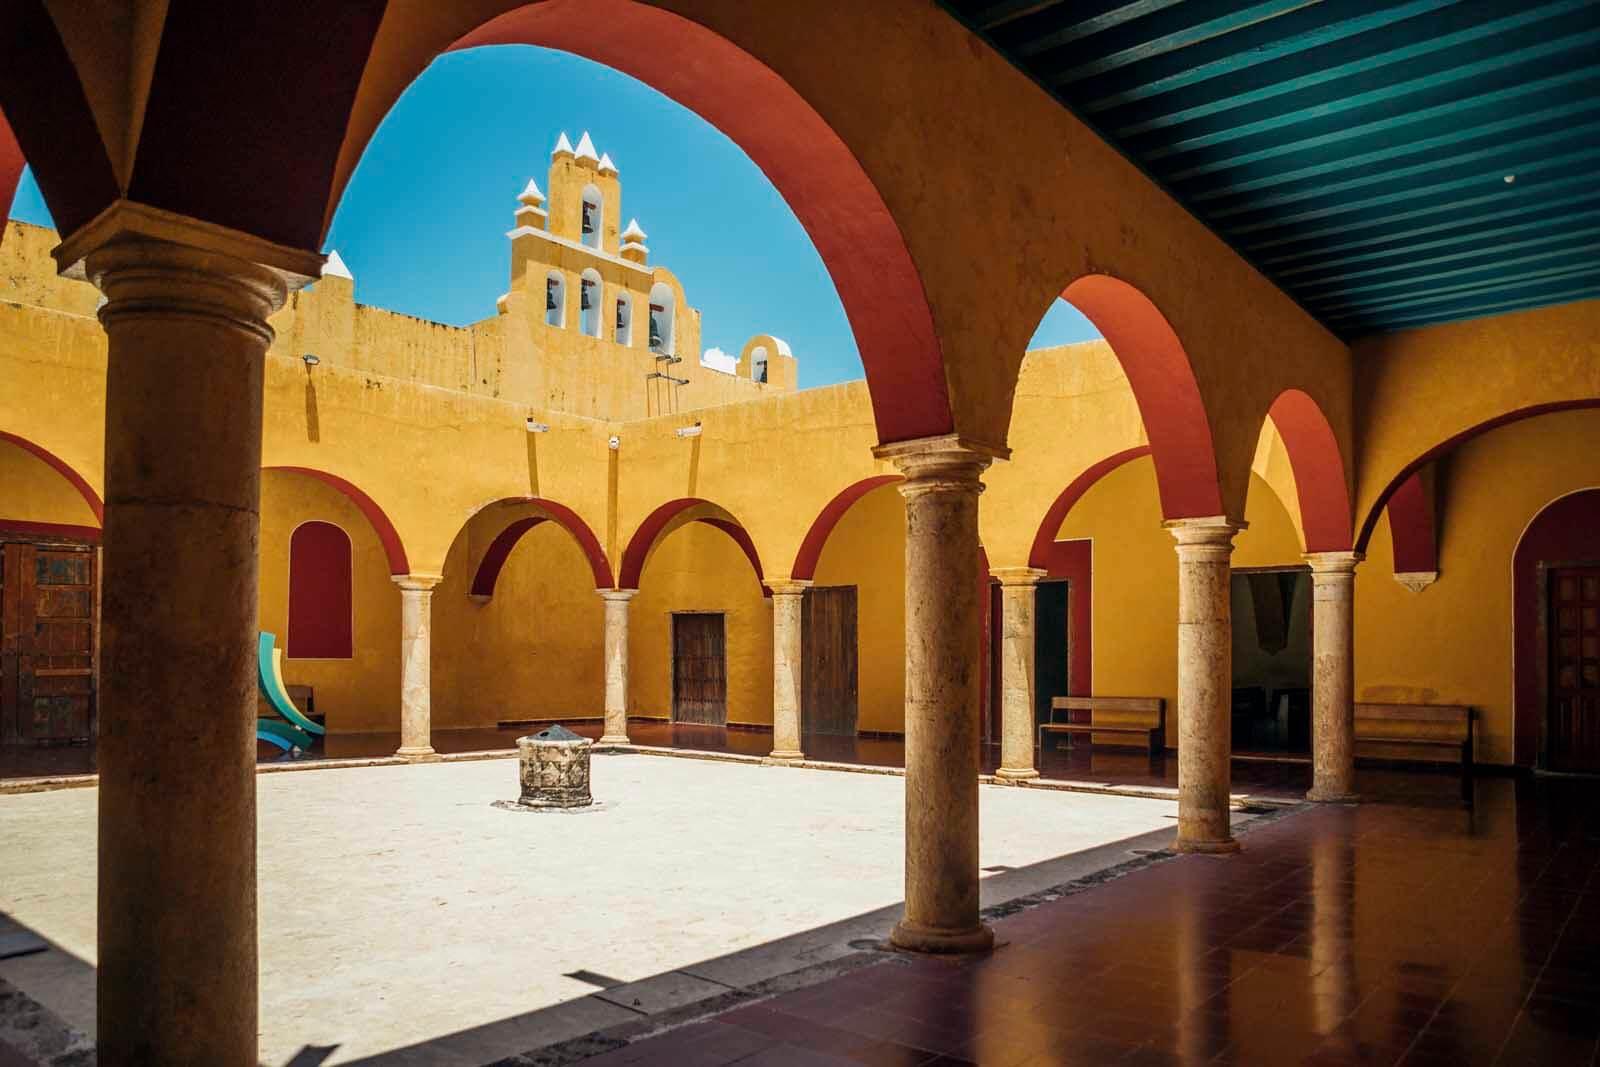 Beautiful interior of building in Campeche Mexico